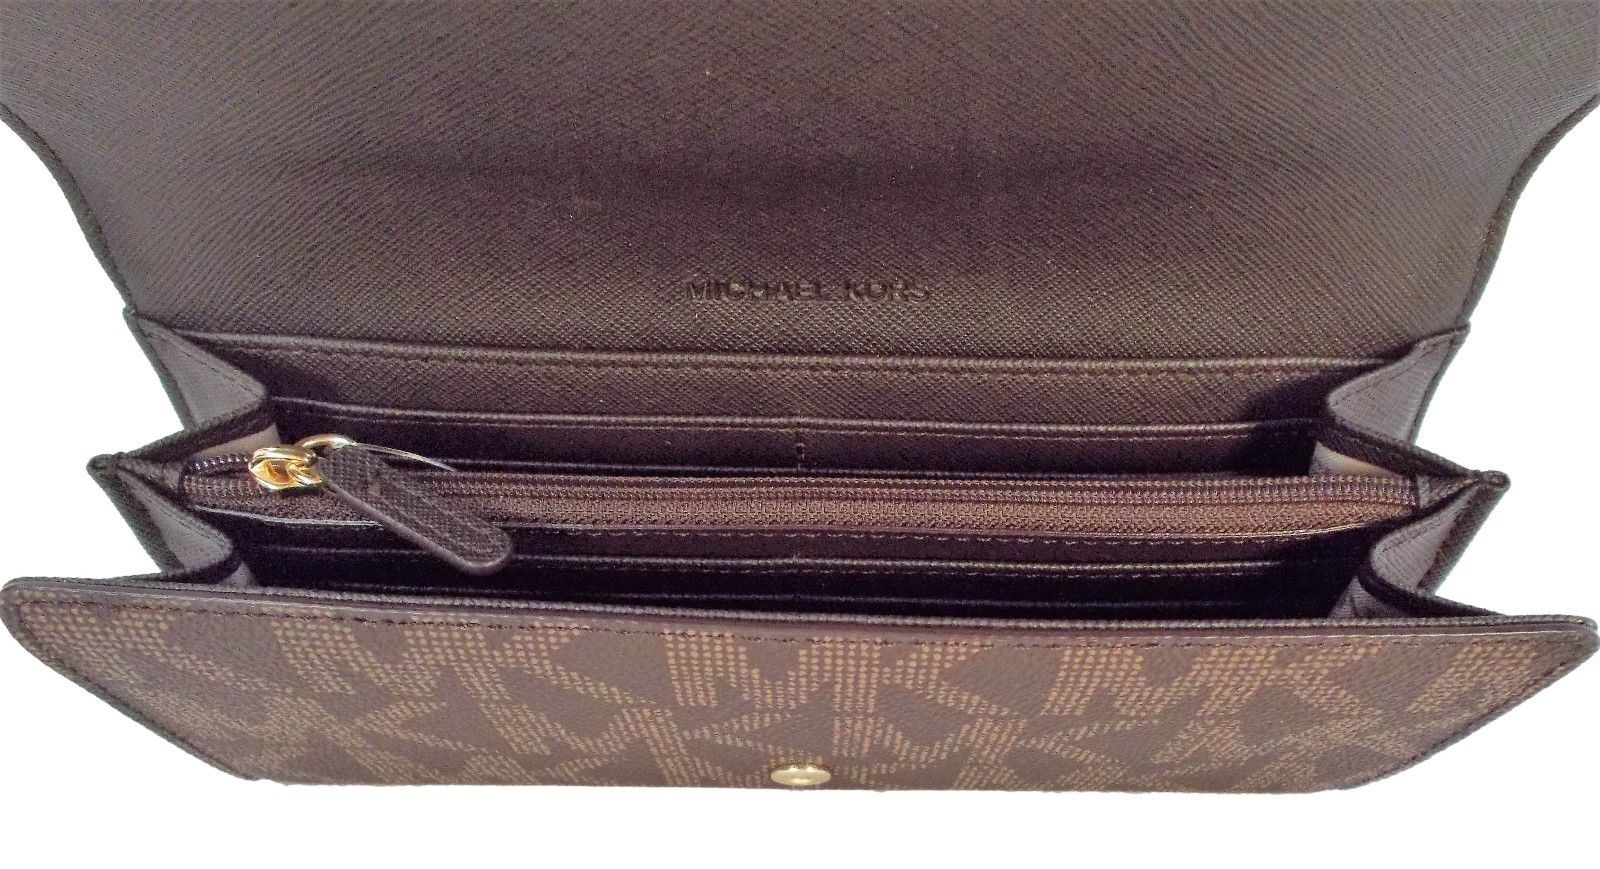 fecde0d32e03bc Michael Kors - Michael Kors Jet Set Travel PVC Signature Carryall LTR  Clutch Wallet in Brown … - Walmart.com